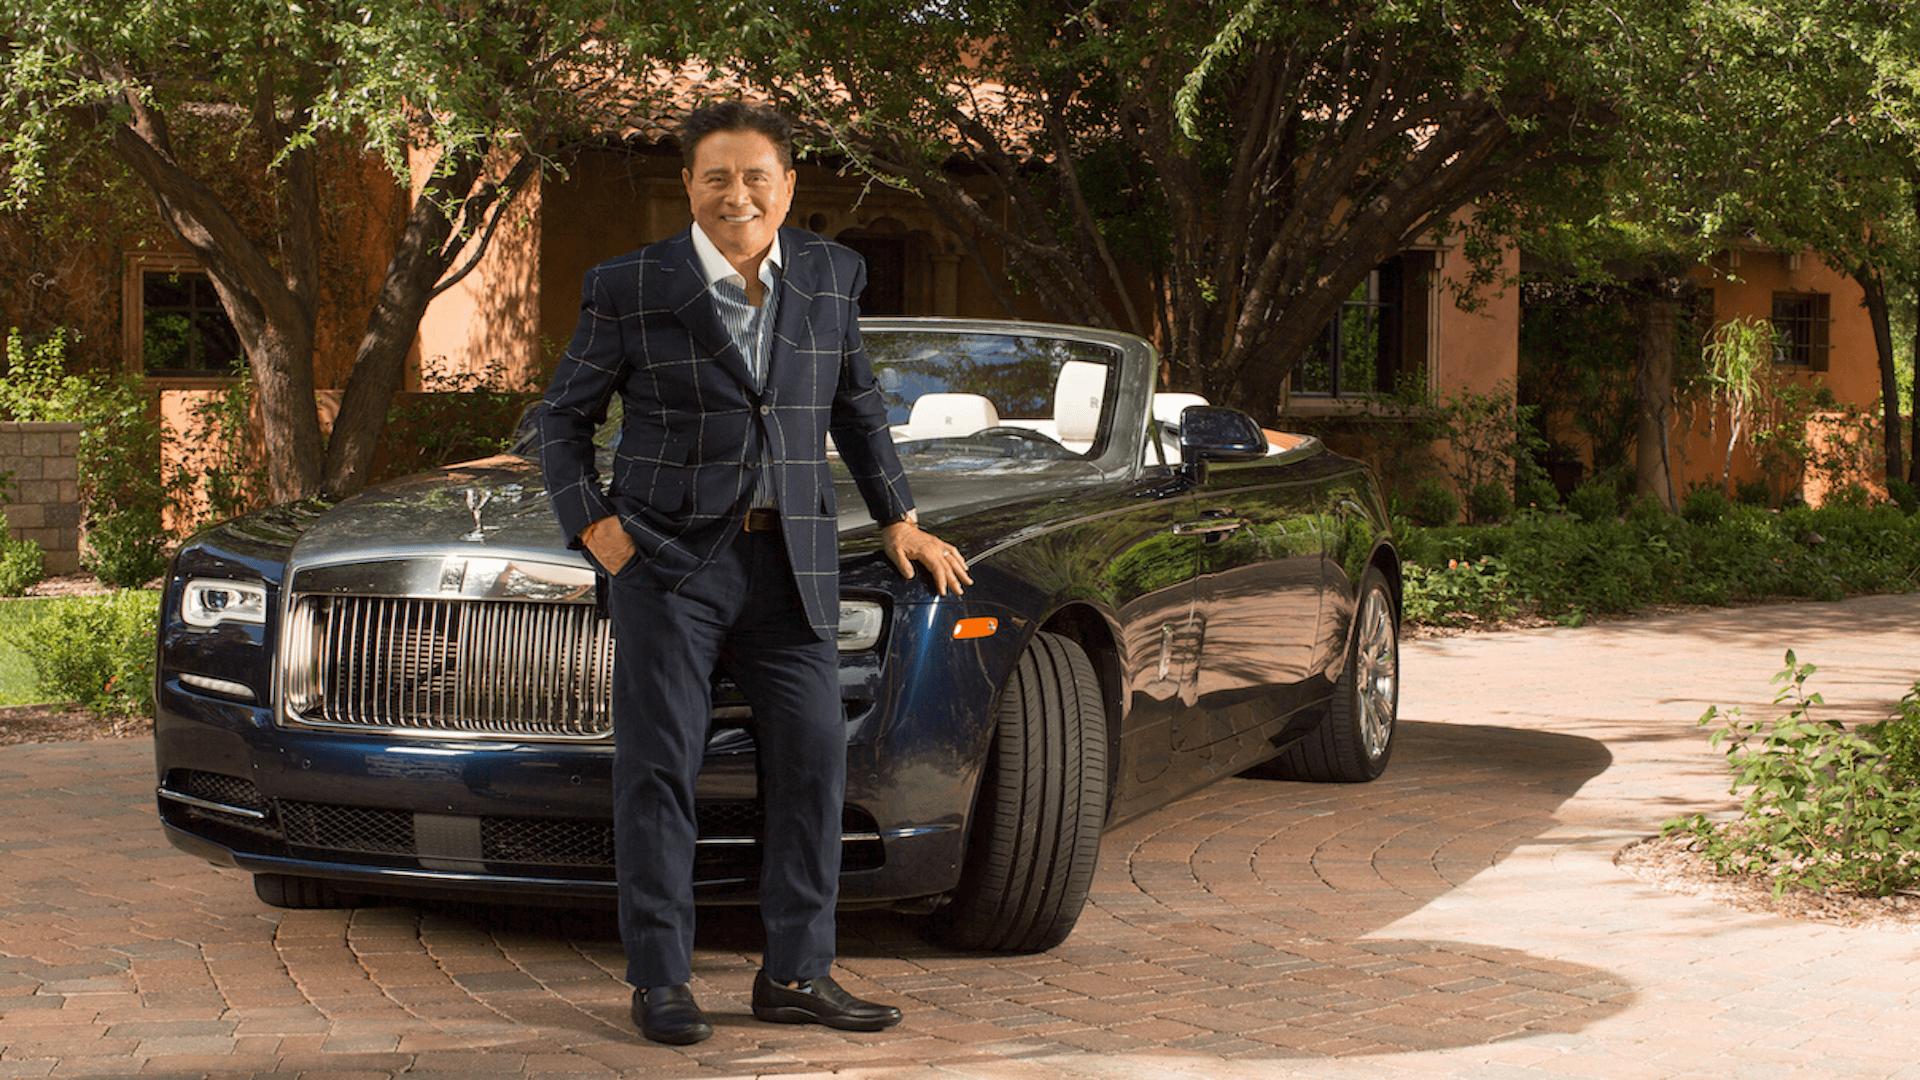 Robert Kiyosaki Reveals the Best Money Advice He Ever Received